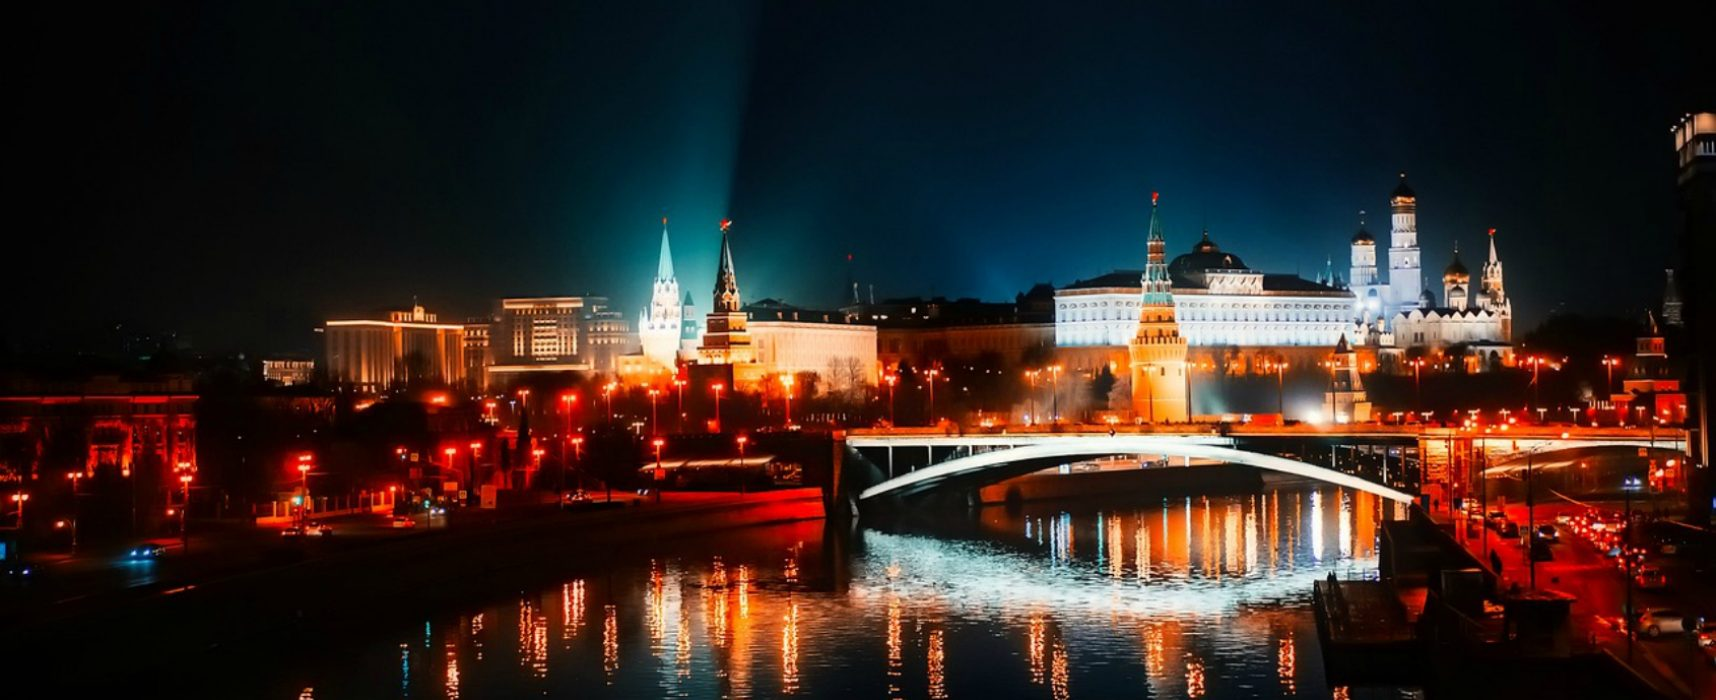 Russian 'hybrid warrior' gets help from pro-Kremlin media in Poland